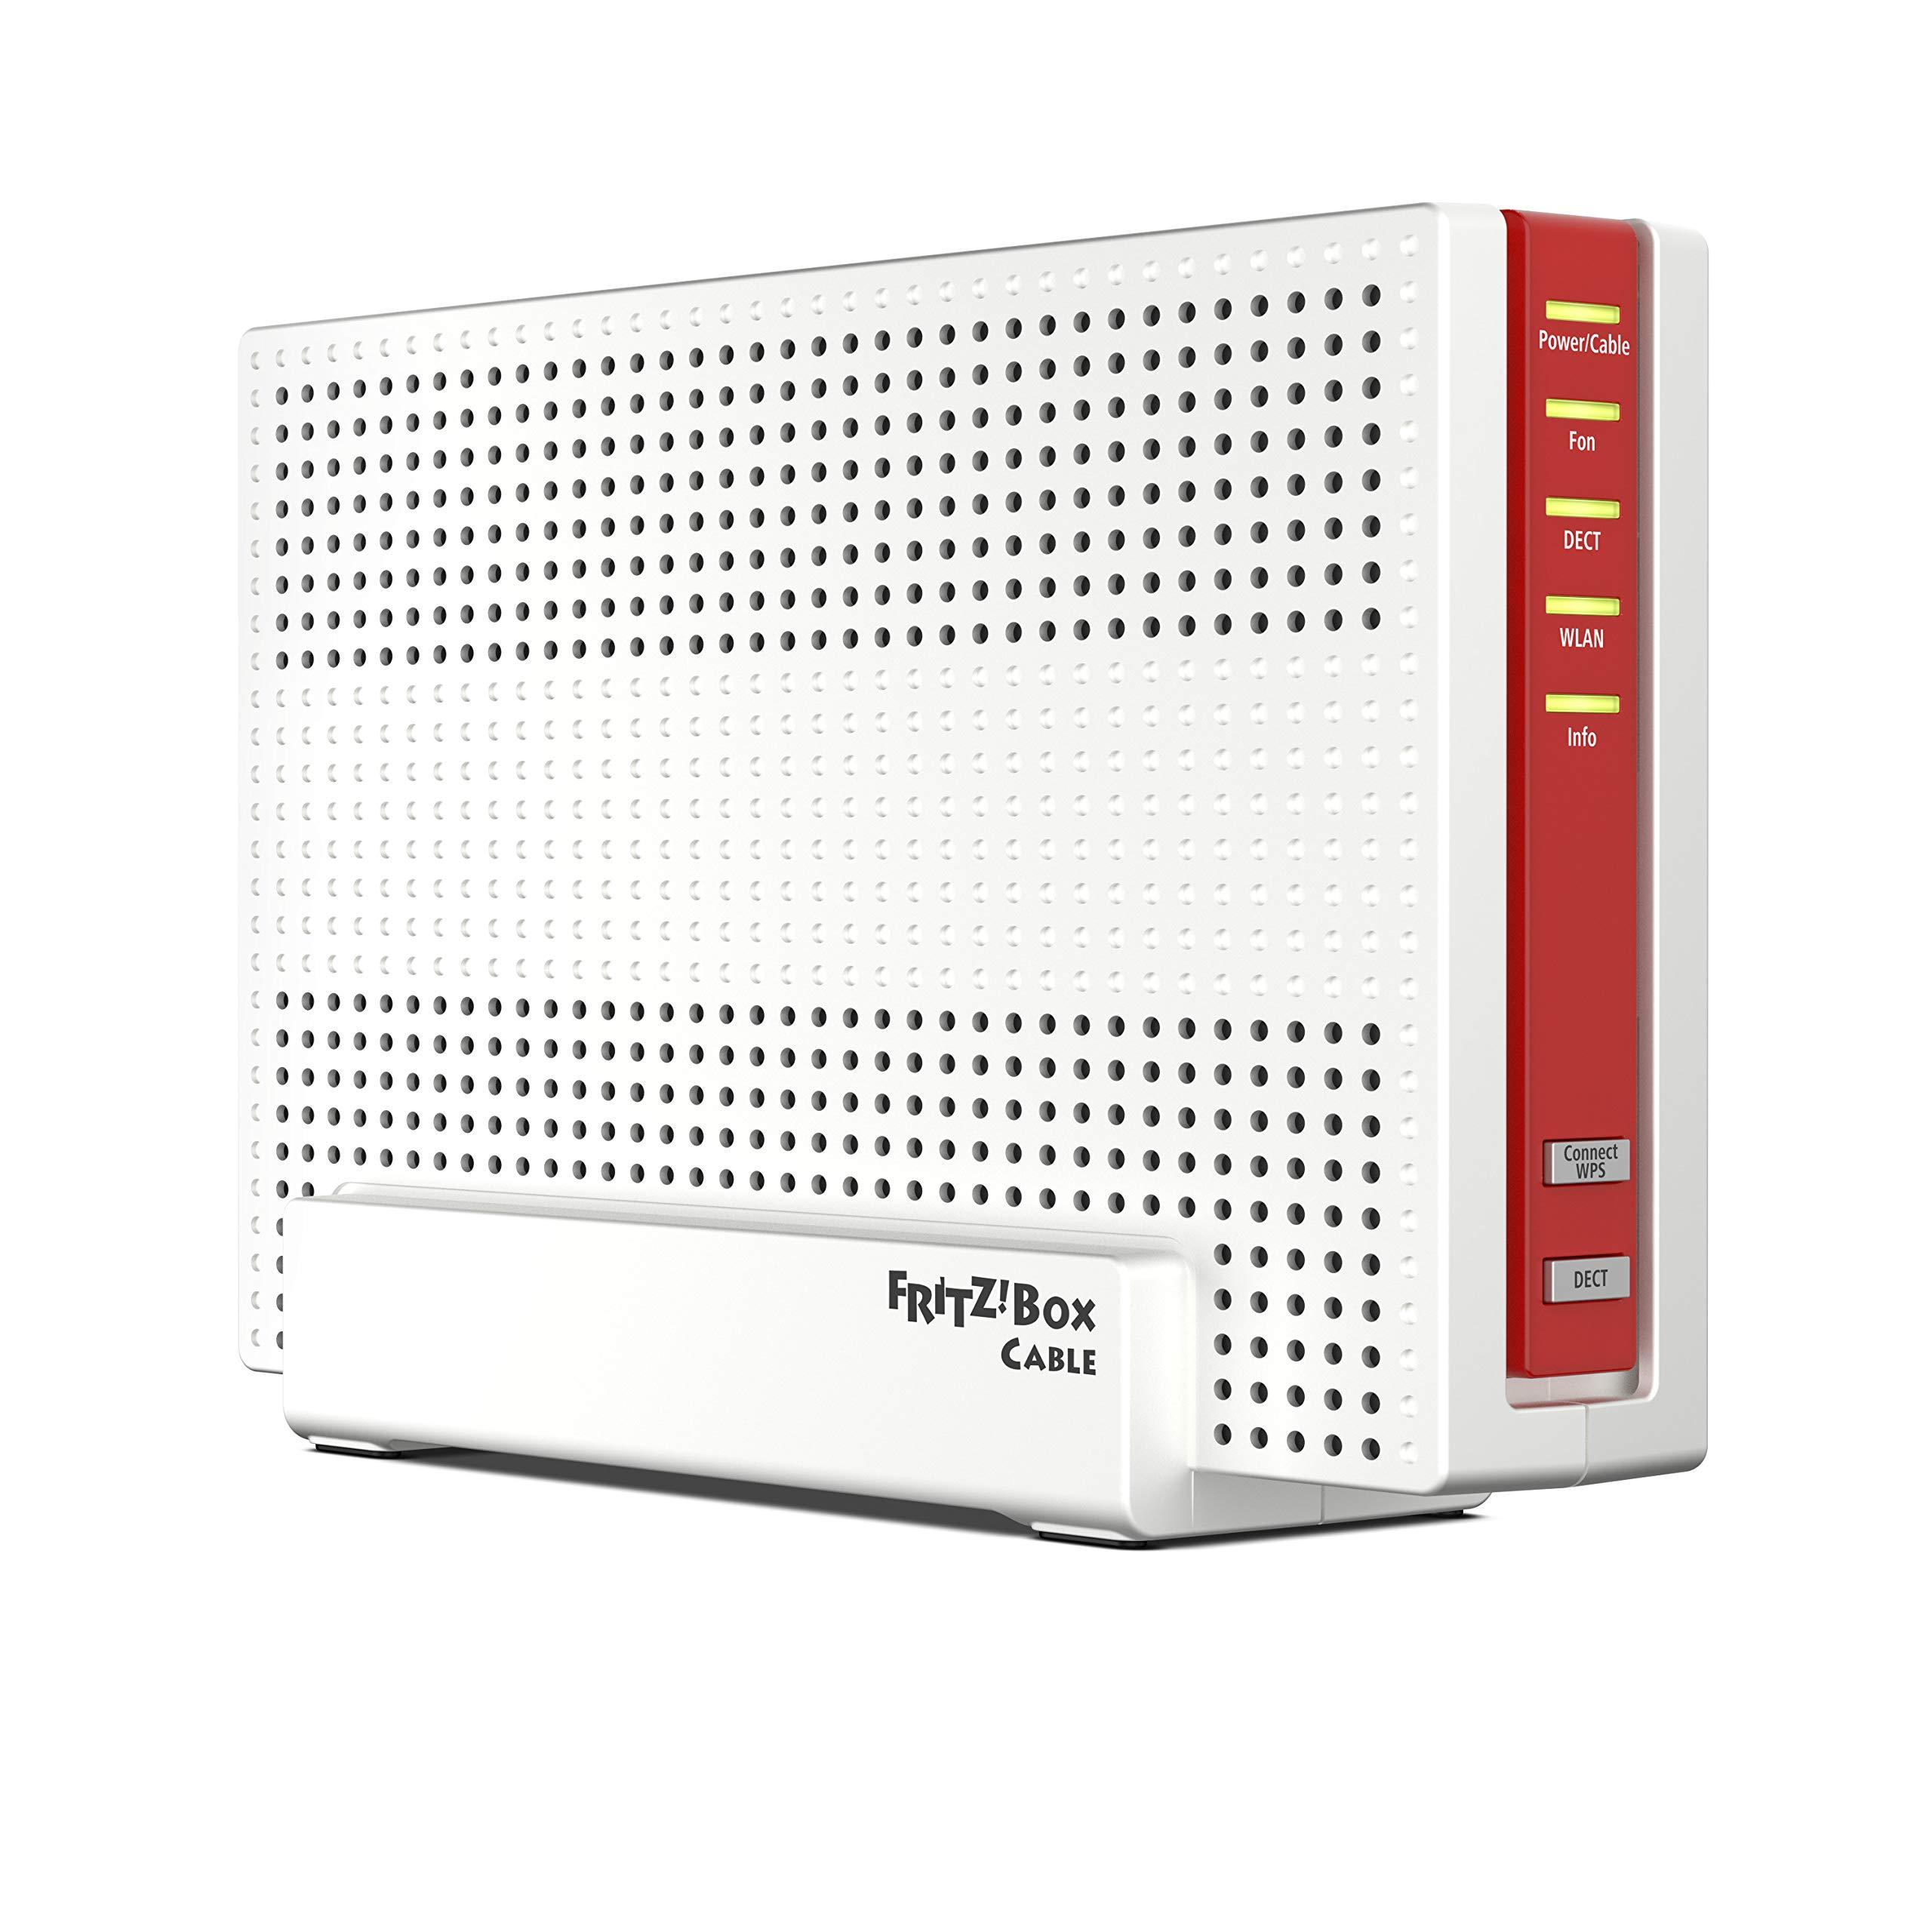 AVM Fritz!Box 6591 Cable WLAN AC + N Router (DOCSIS-3.1-Kabelmodem, Dual-WLAN Ac+N (MU-MIMO) mit 1733 (5 GHz) + 800 Mbit…